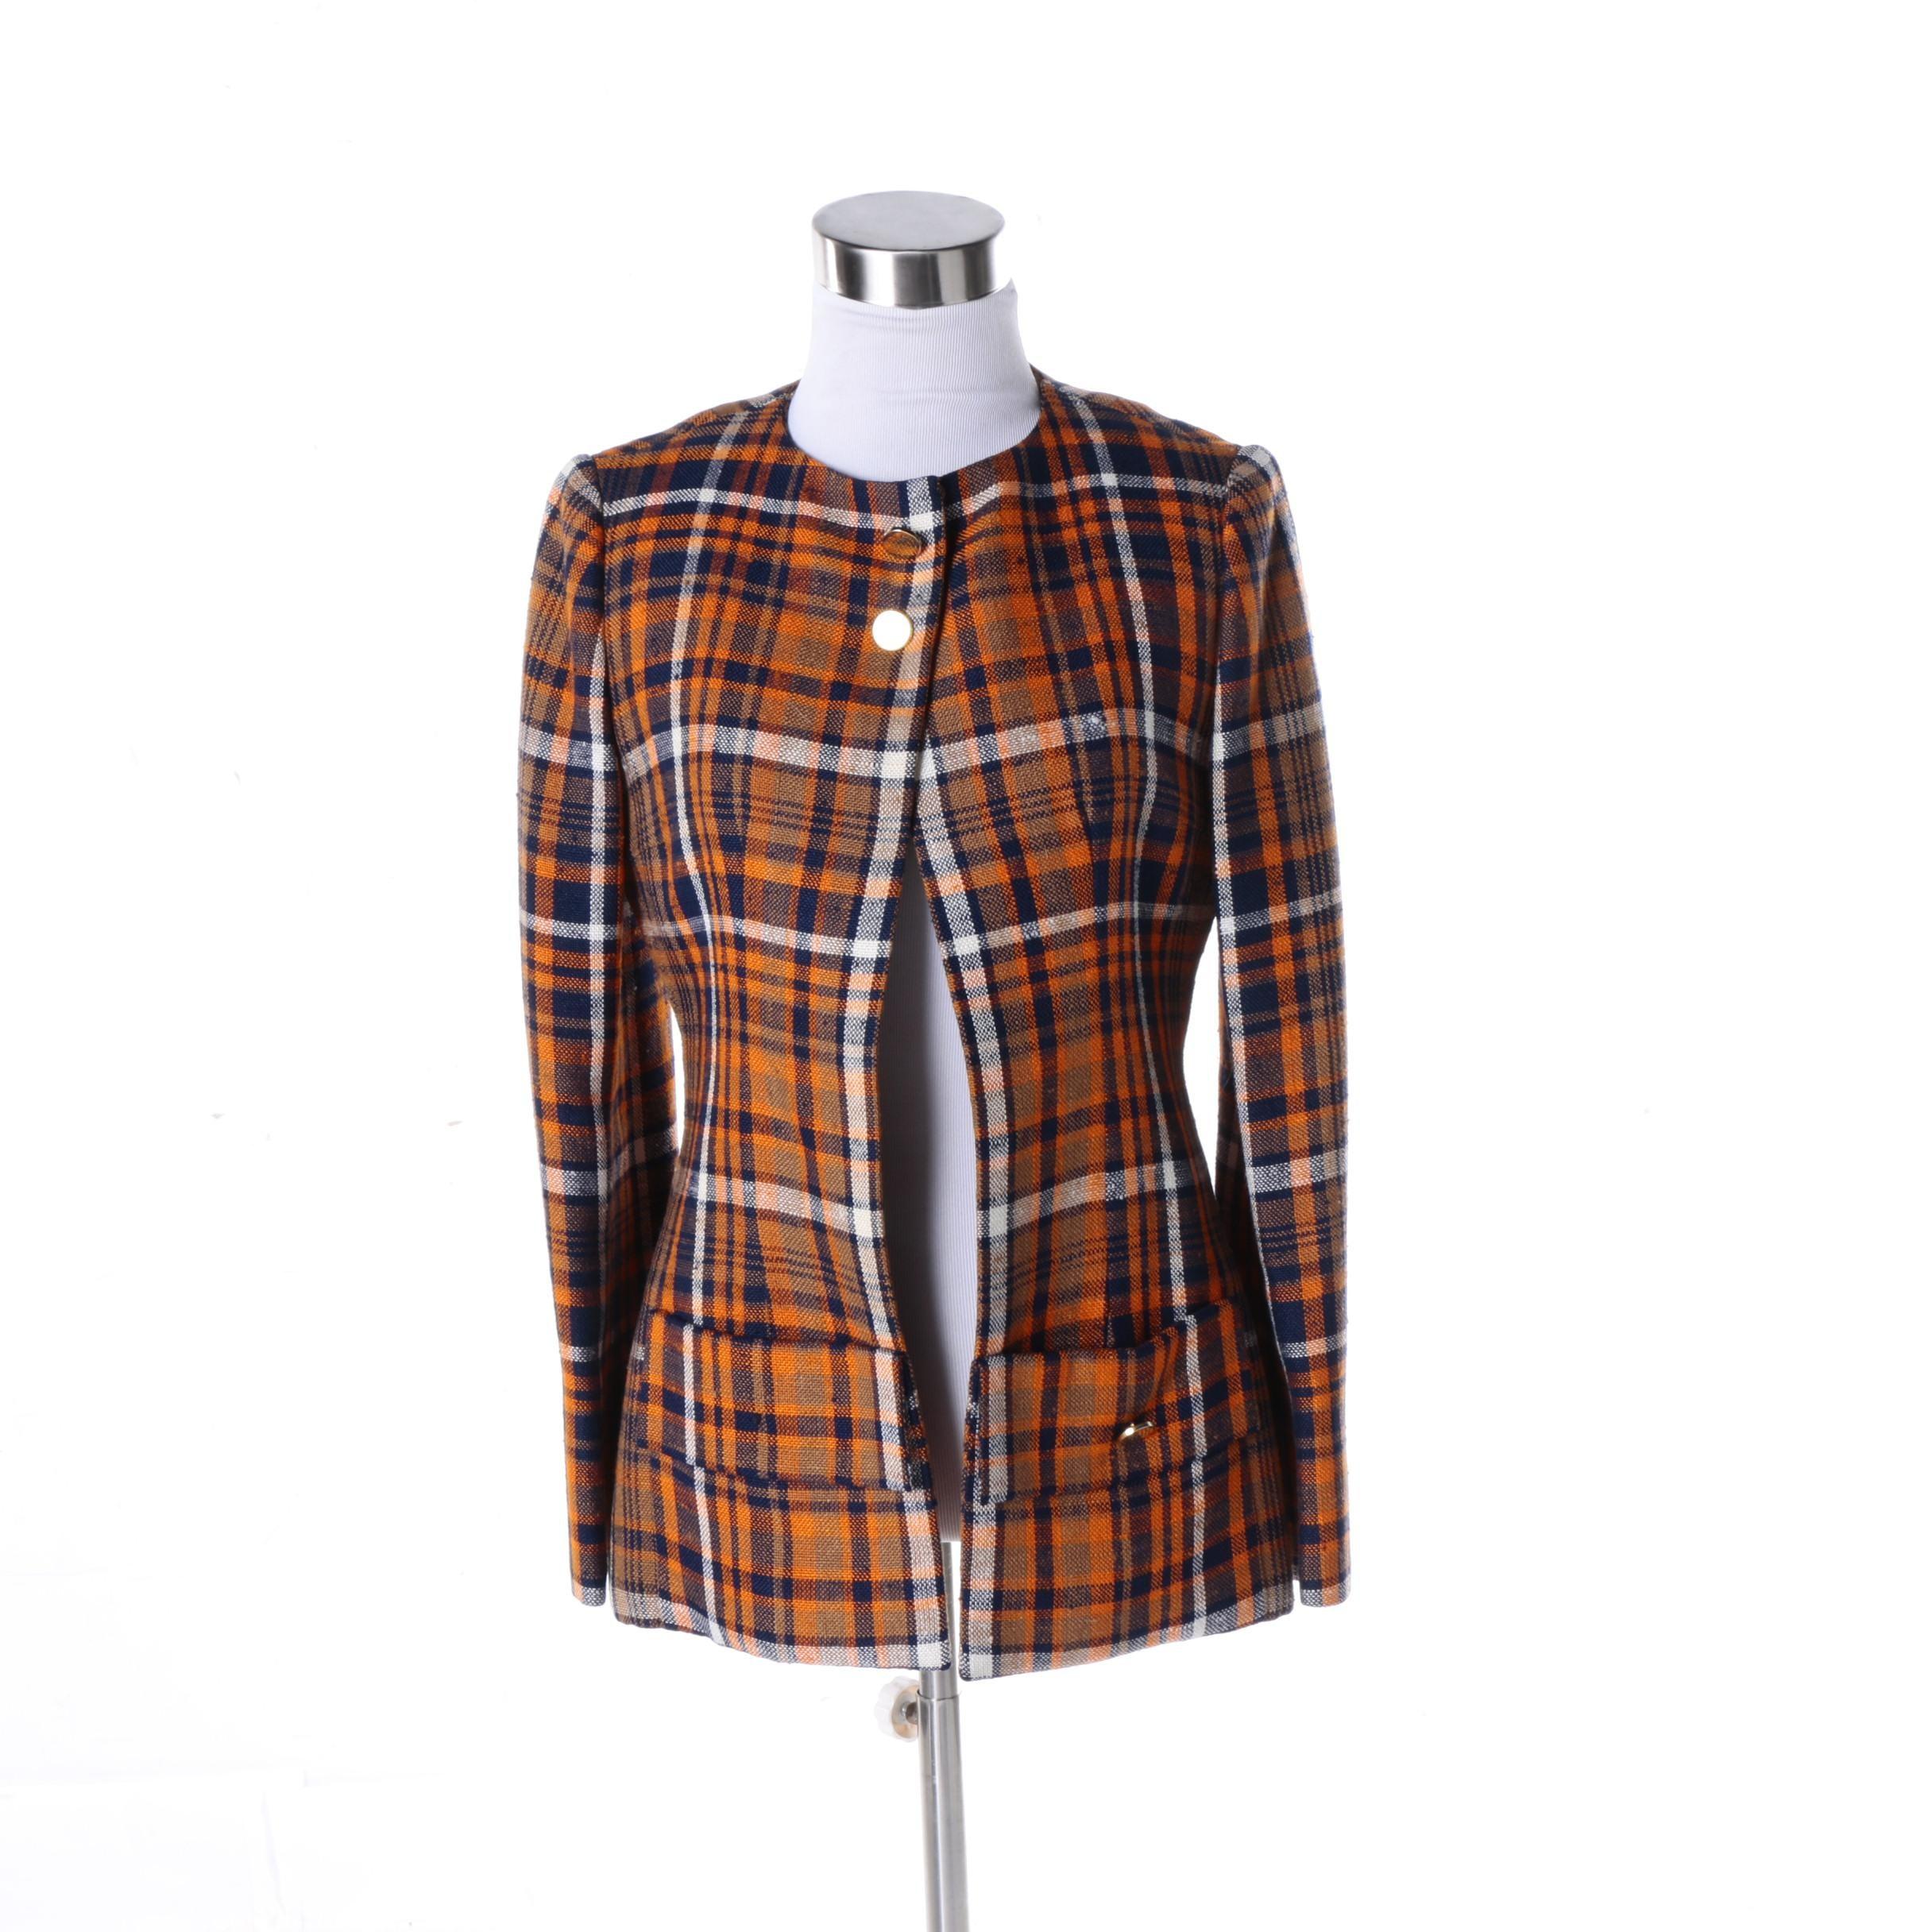 Women's Vintage Cardinali Plaid Wool Blend Jacket